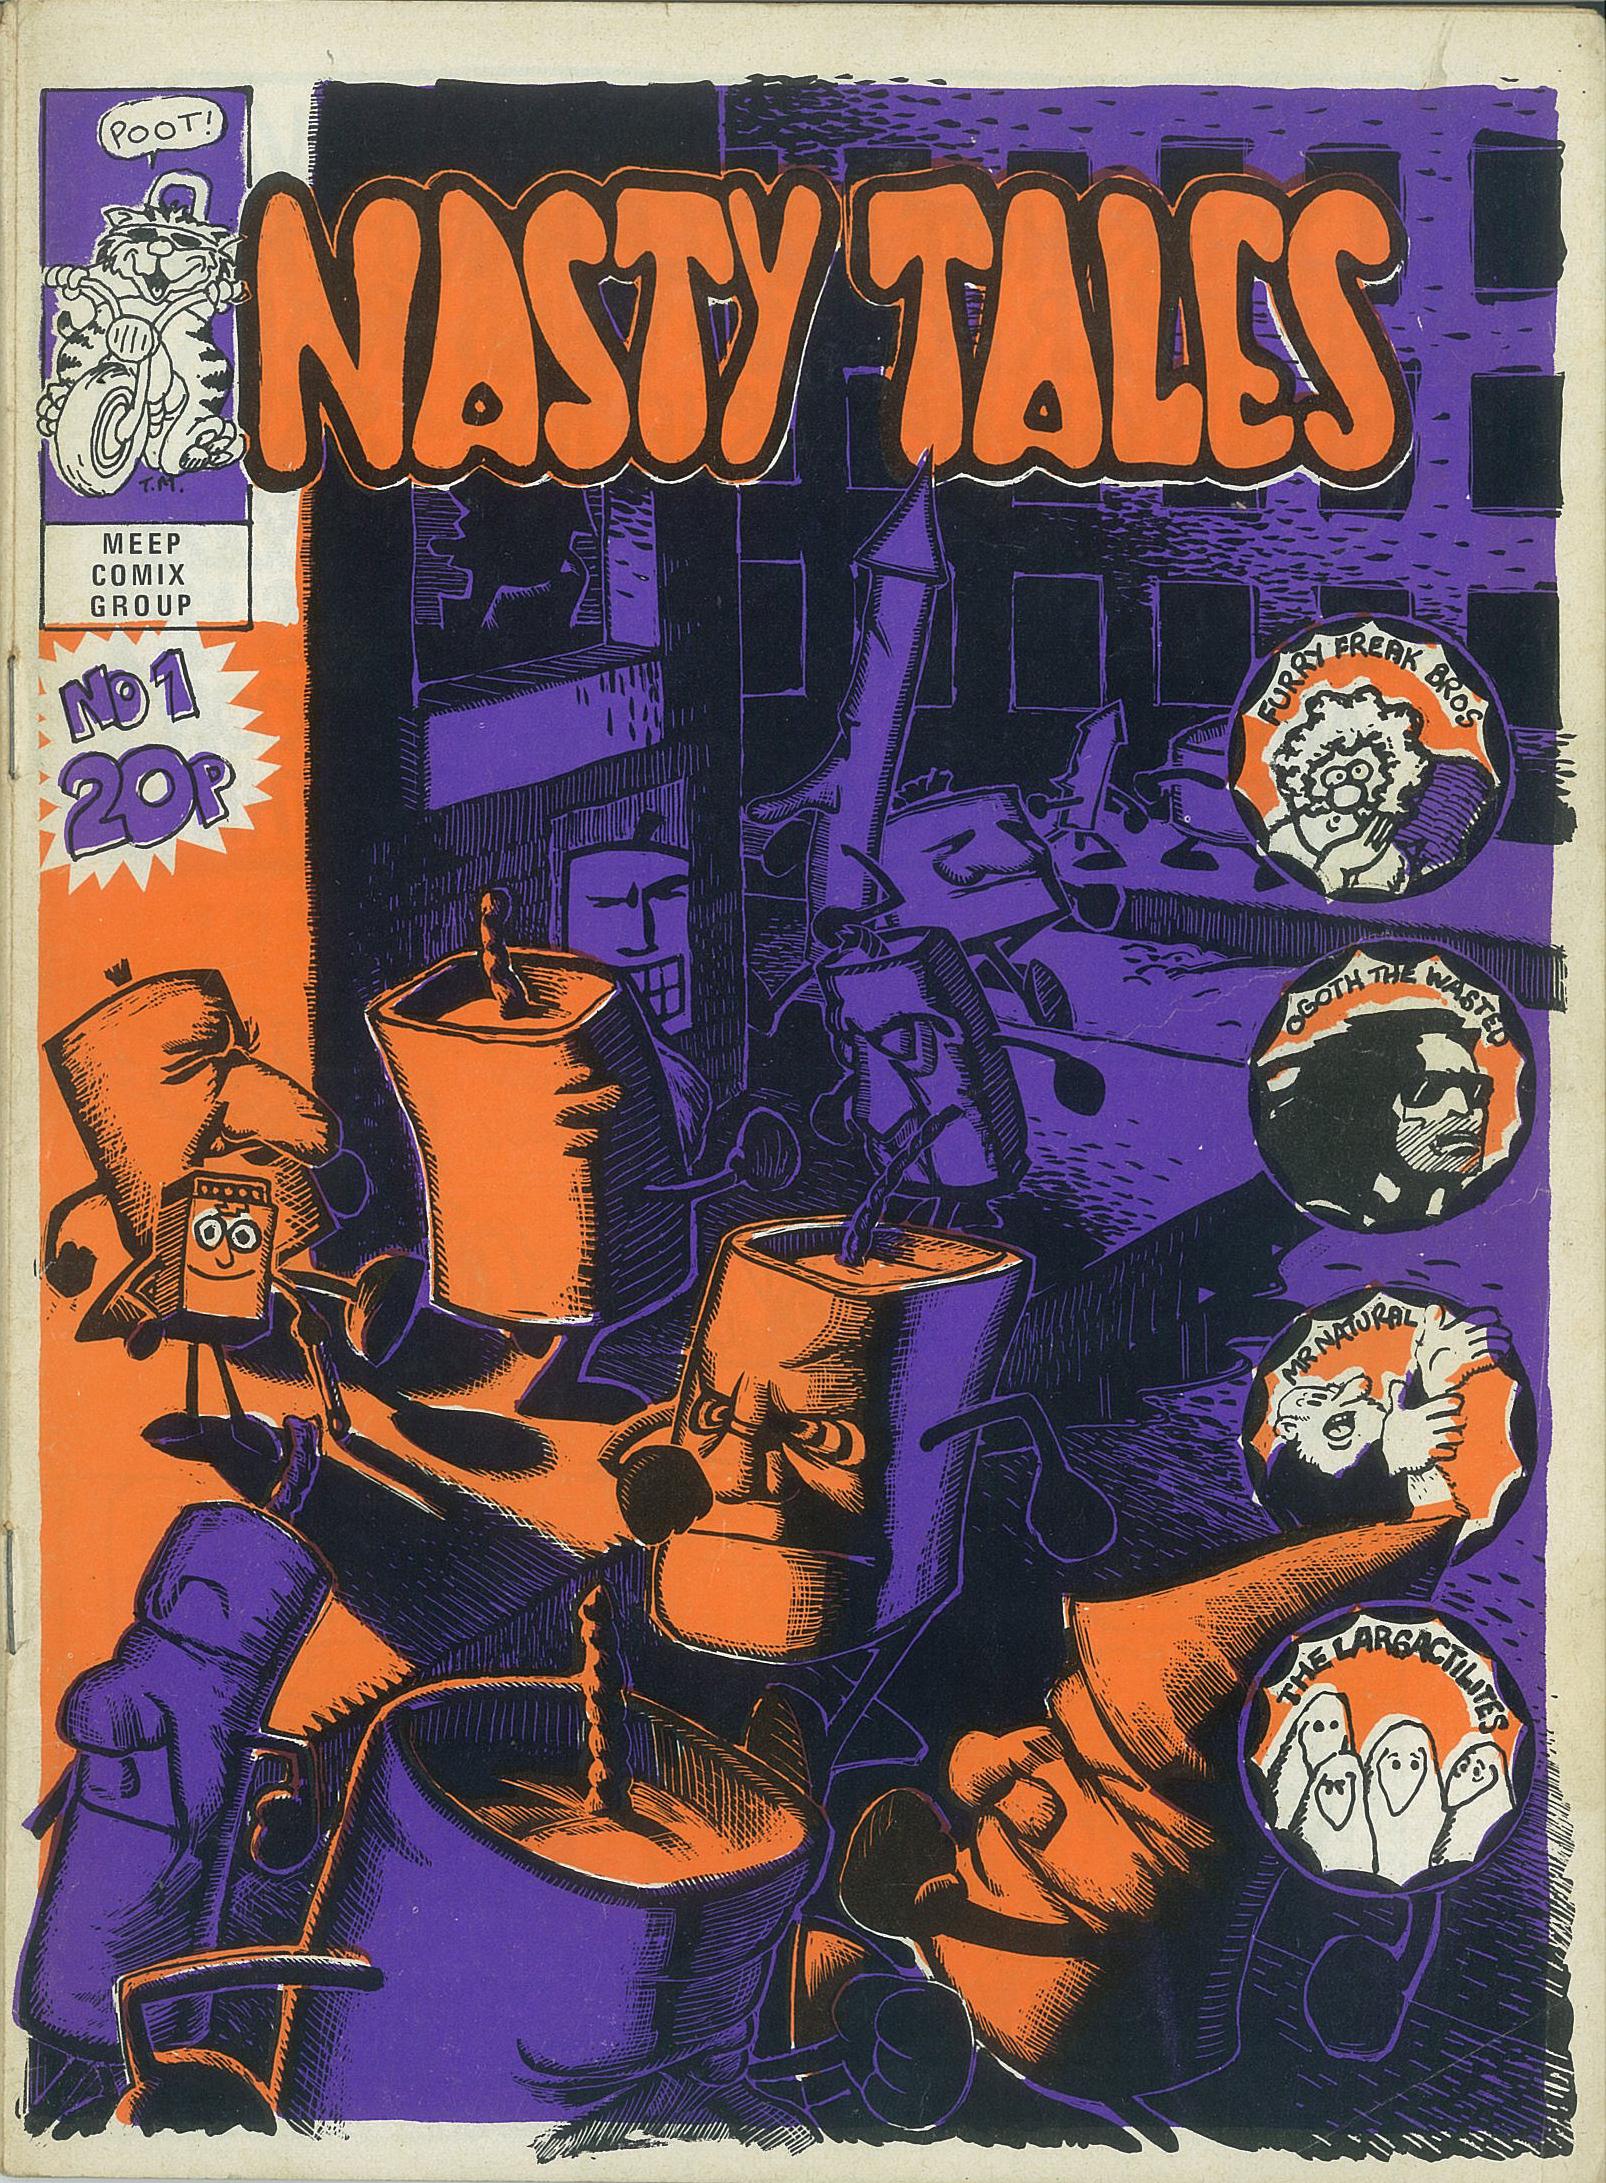 Nasty Tales-1. 1971